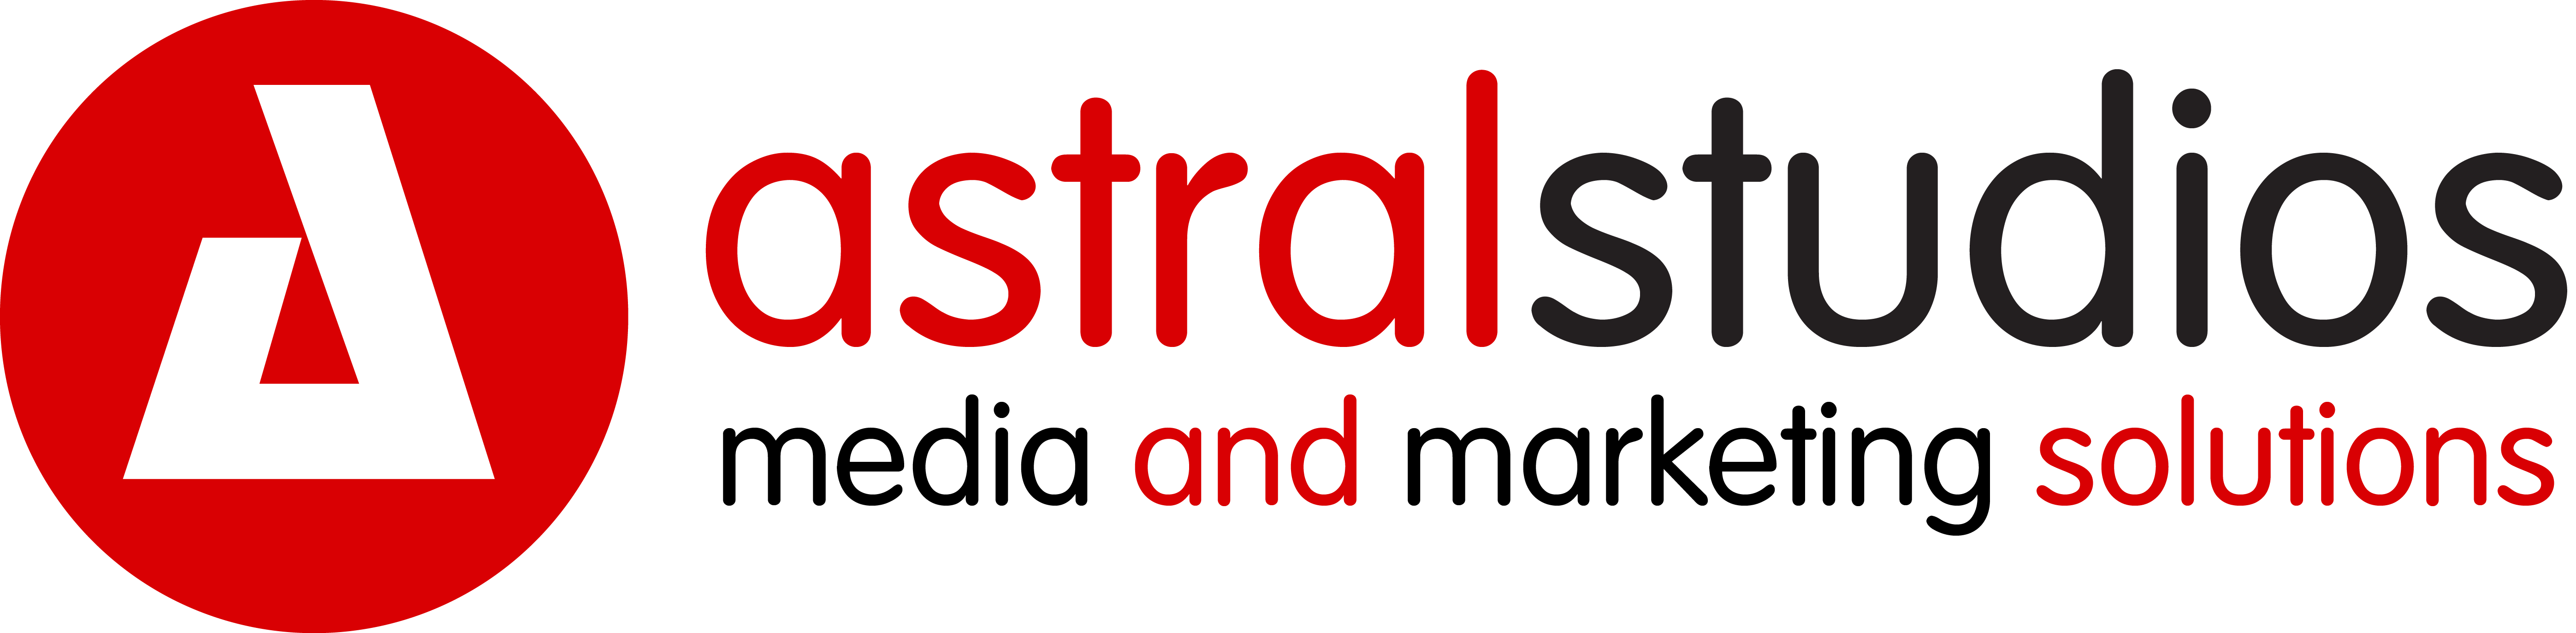 Astral Studios